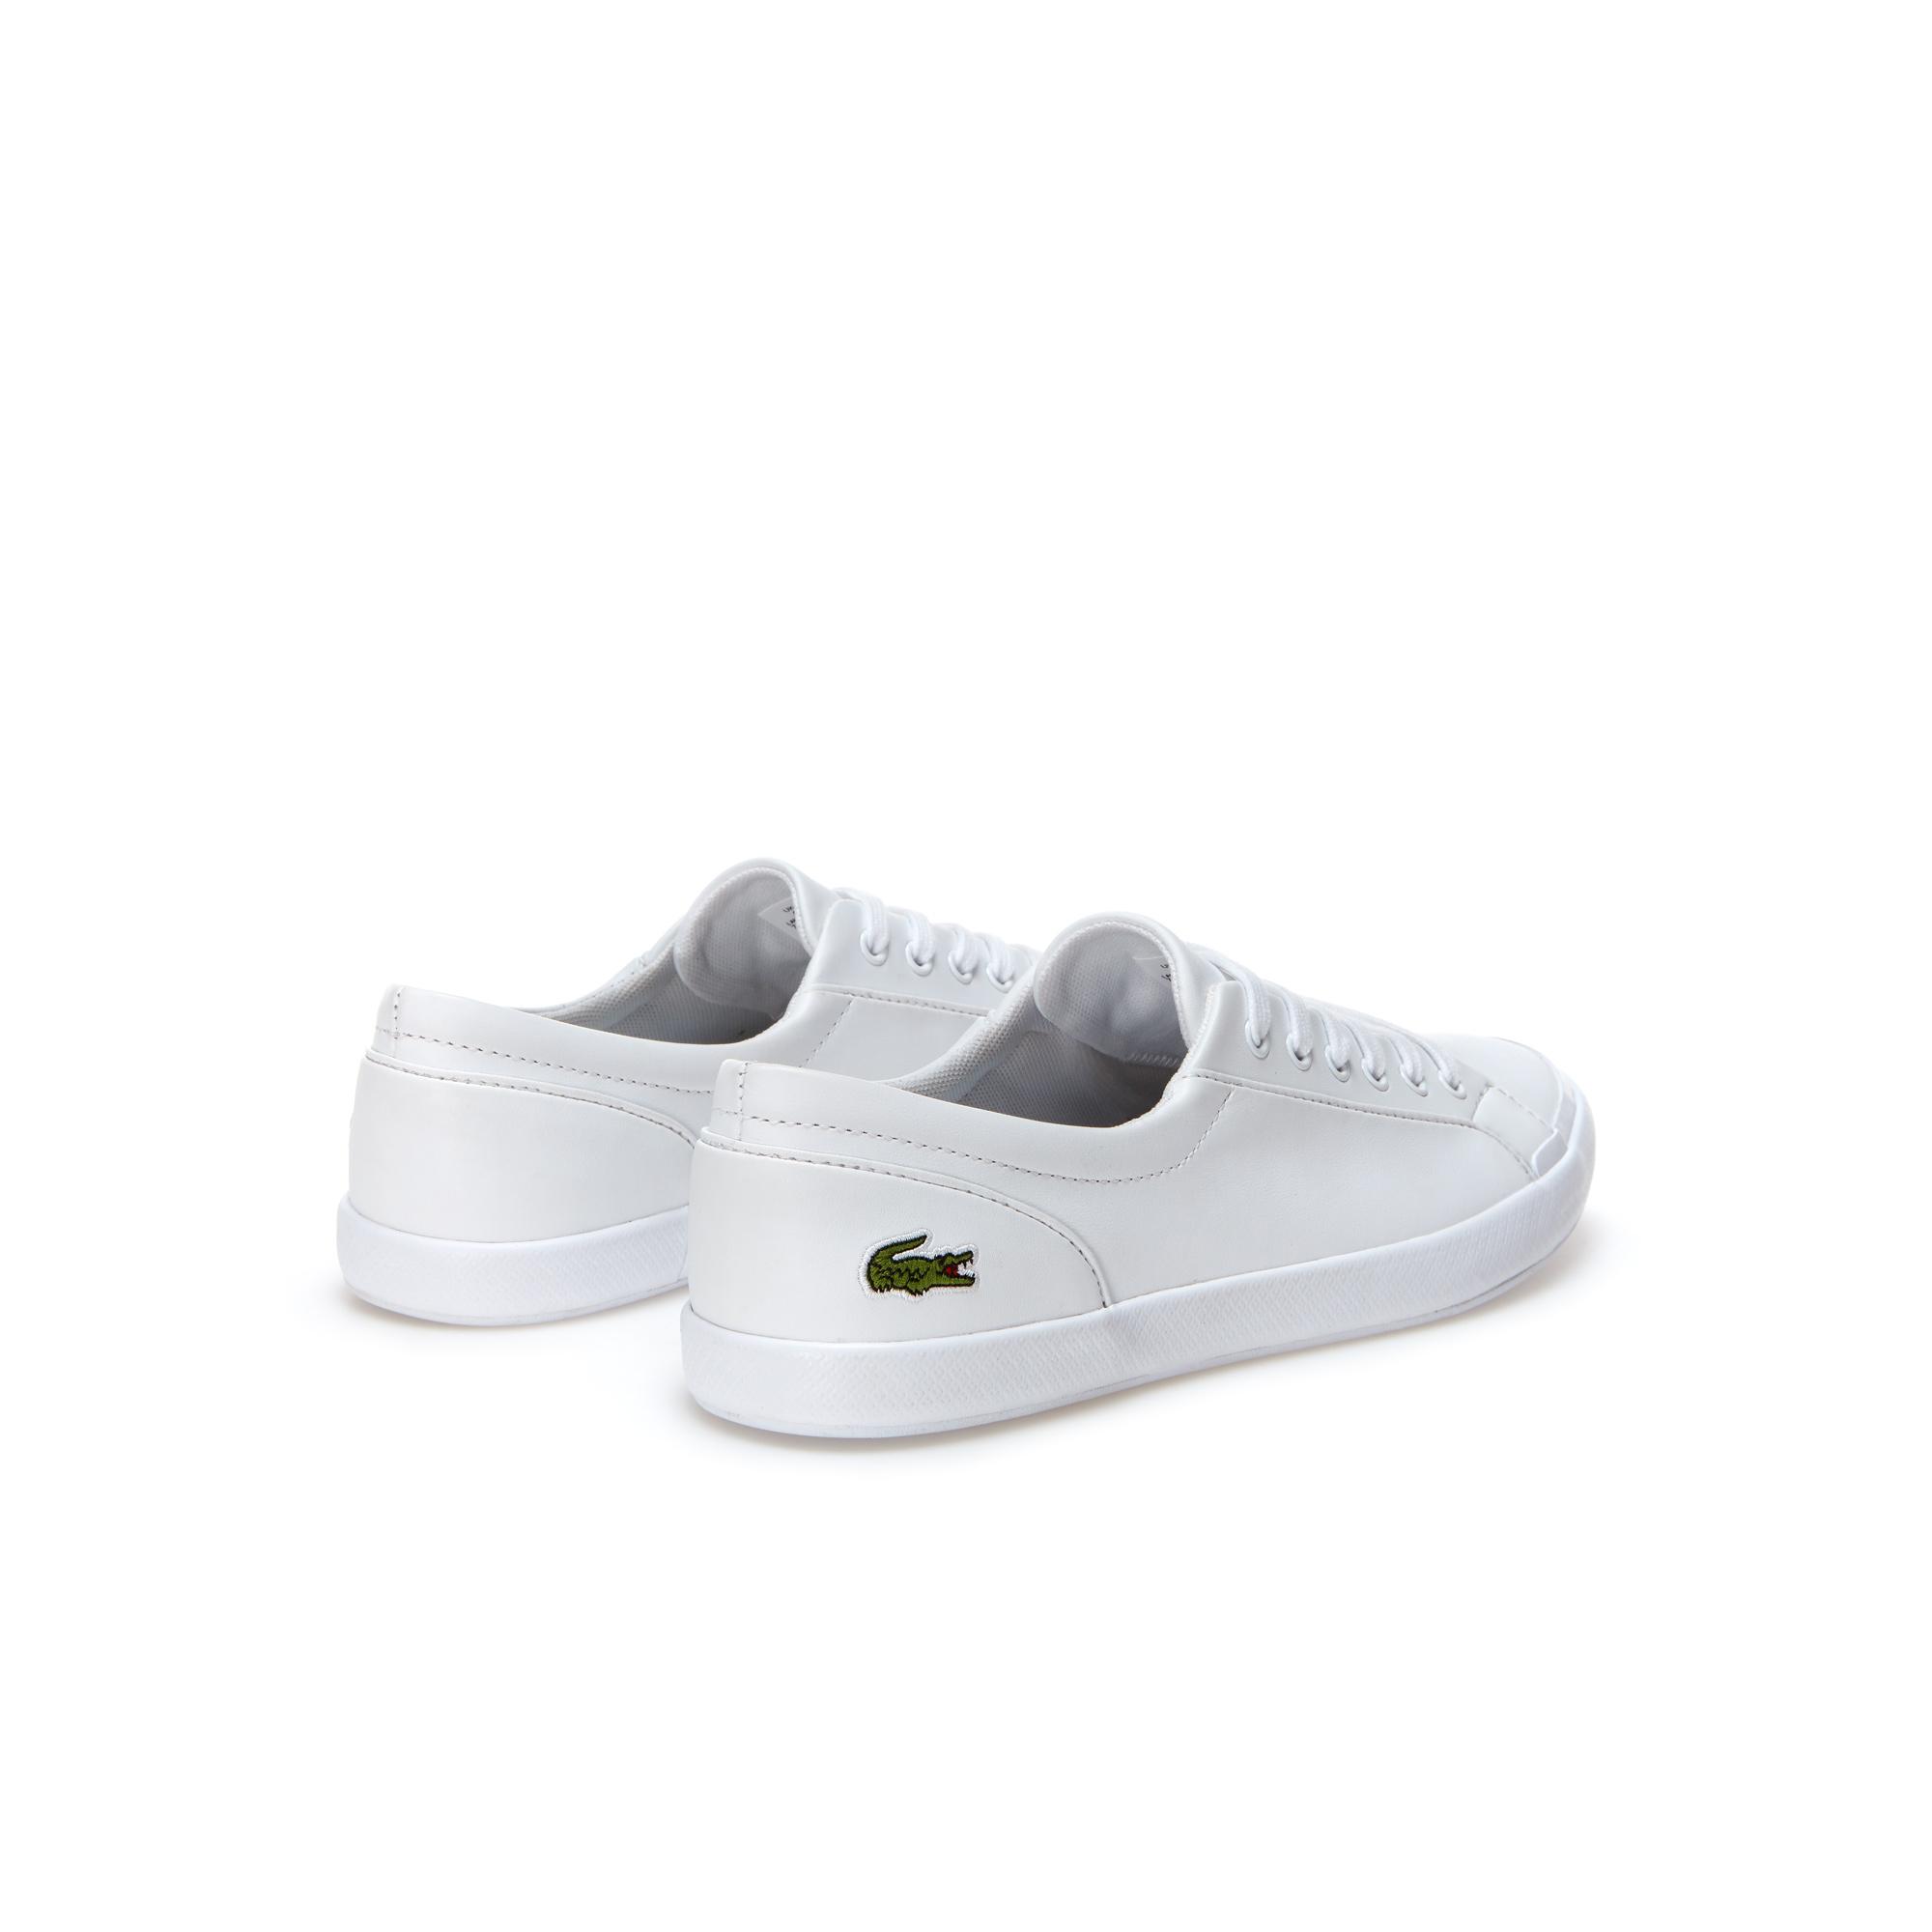 Lacoste Damskie buty Lancelle BL 1